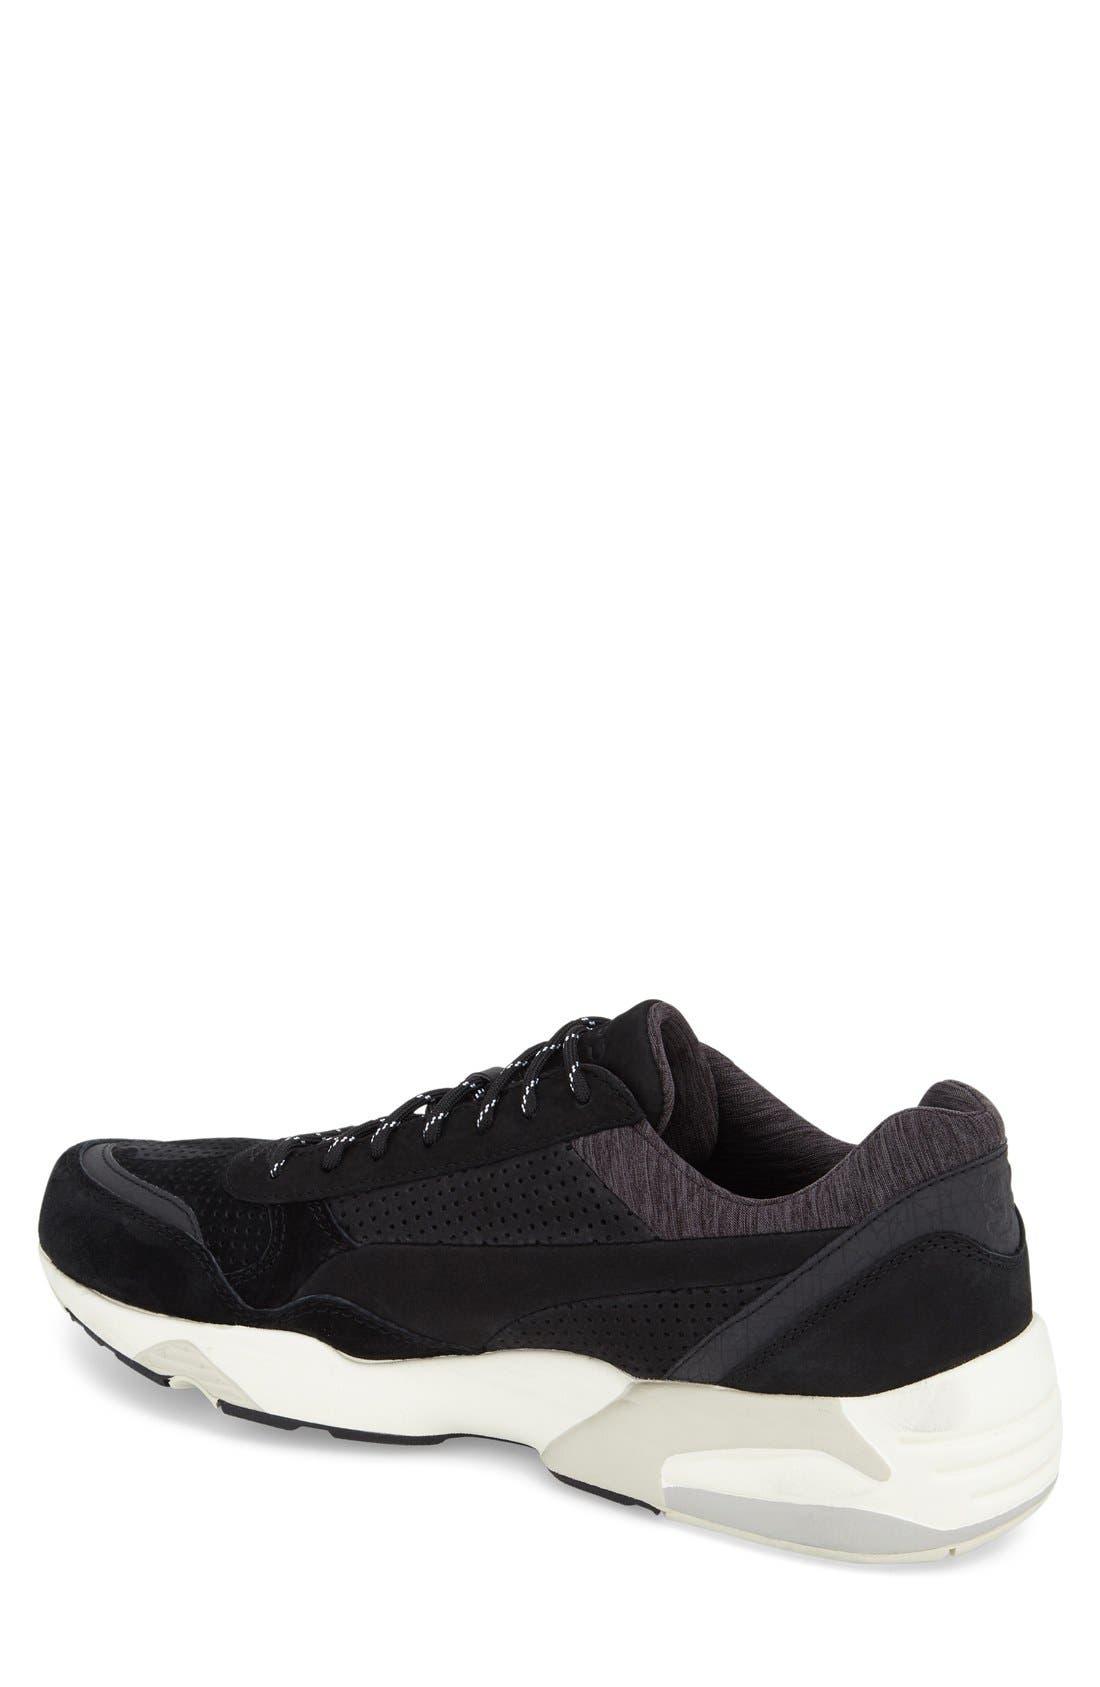 'R698 X STAMPD' Sneaker,                             Alternate thumbnail 3, color,                             001